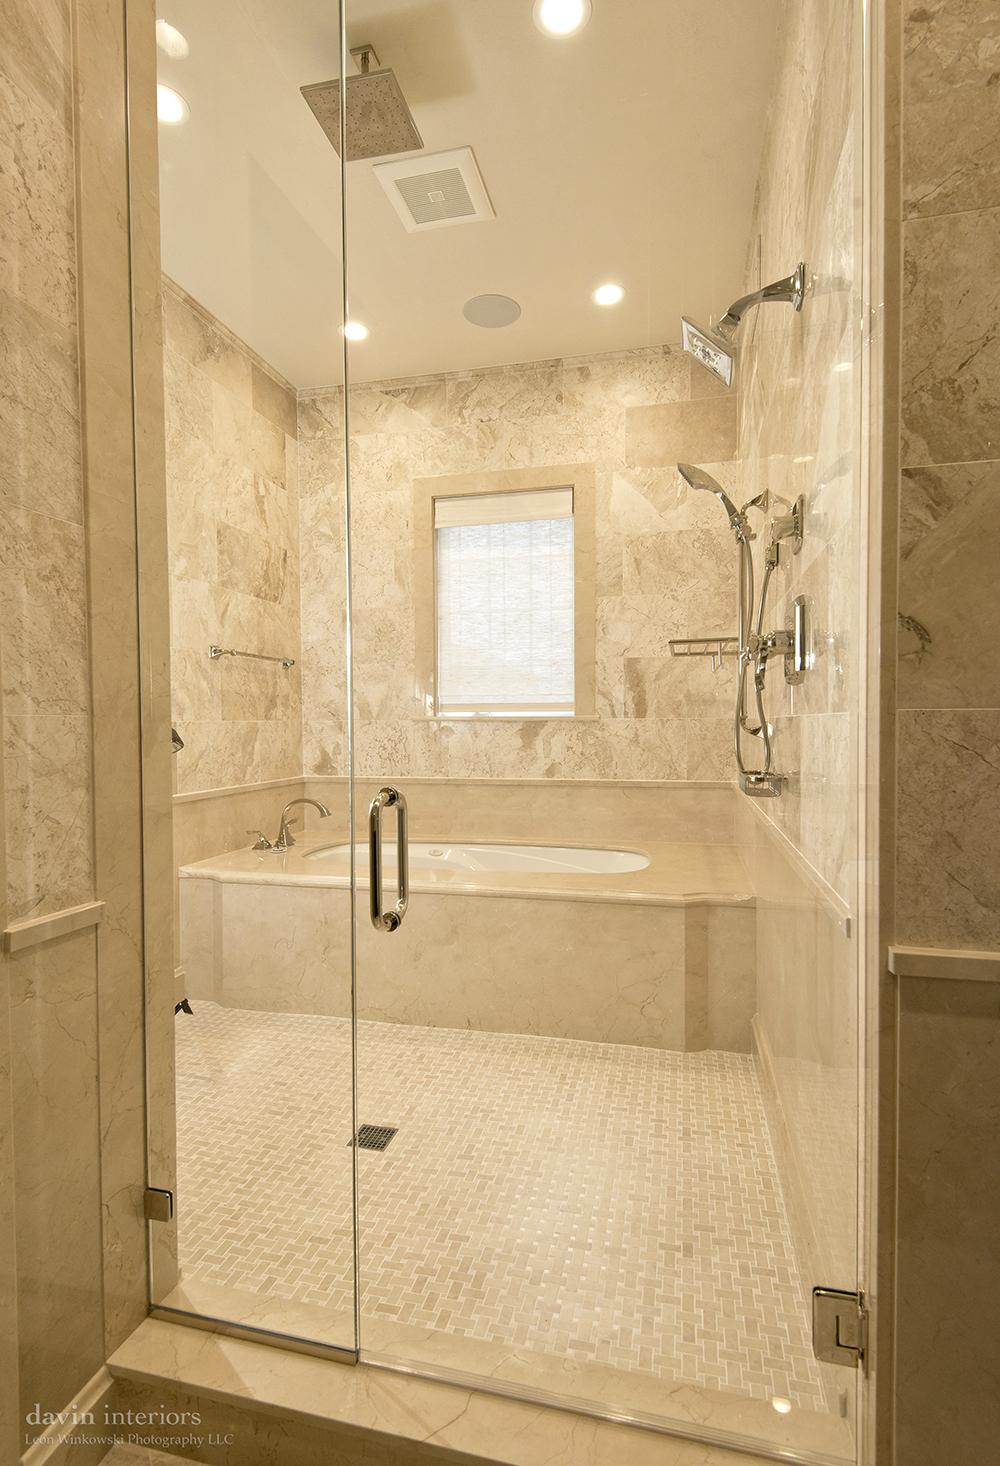 Davin-Interiors-Spa-bathroom.jpg